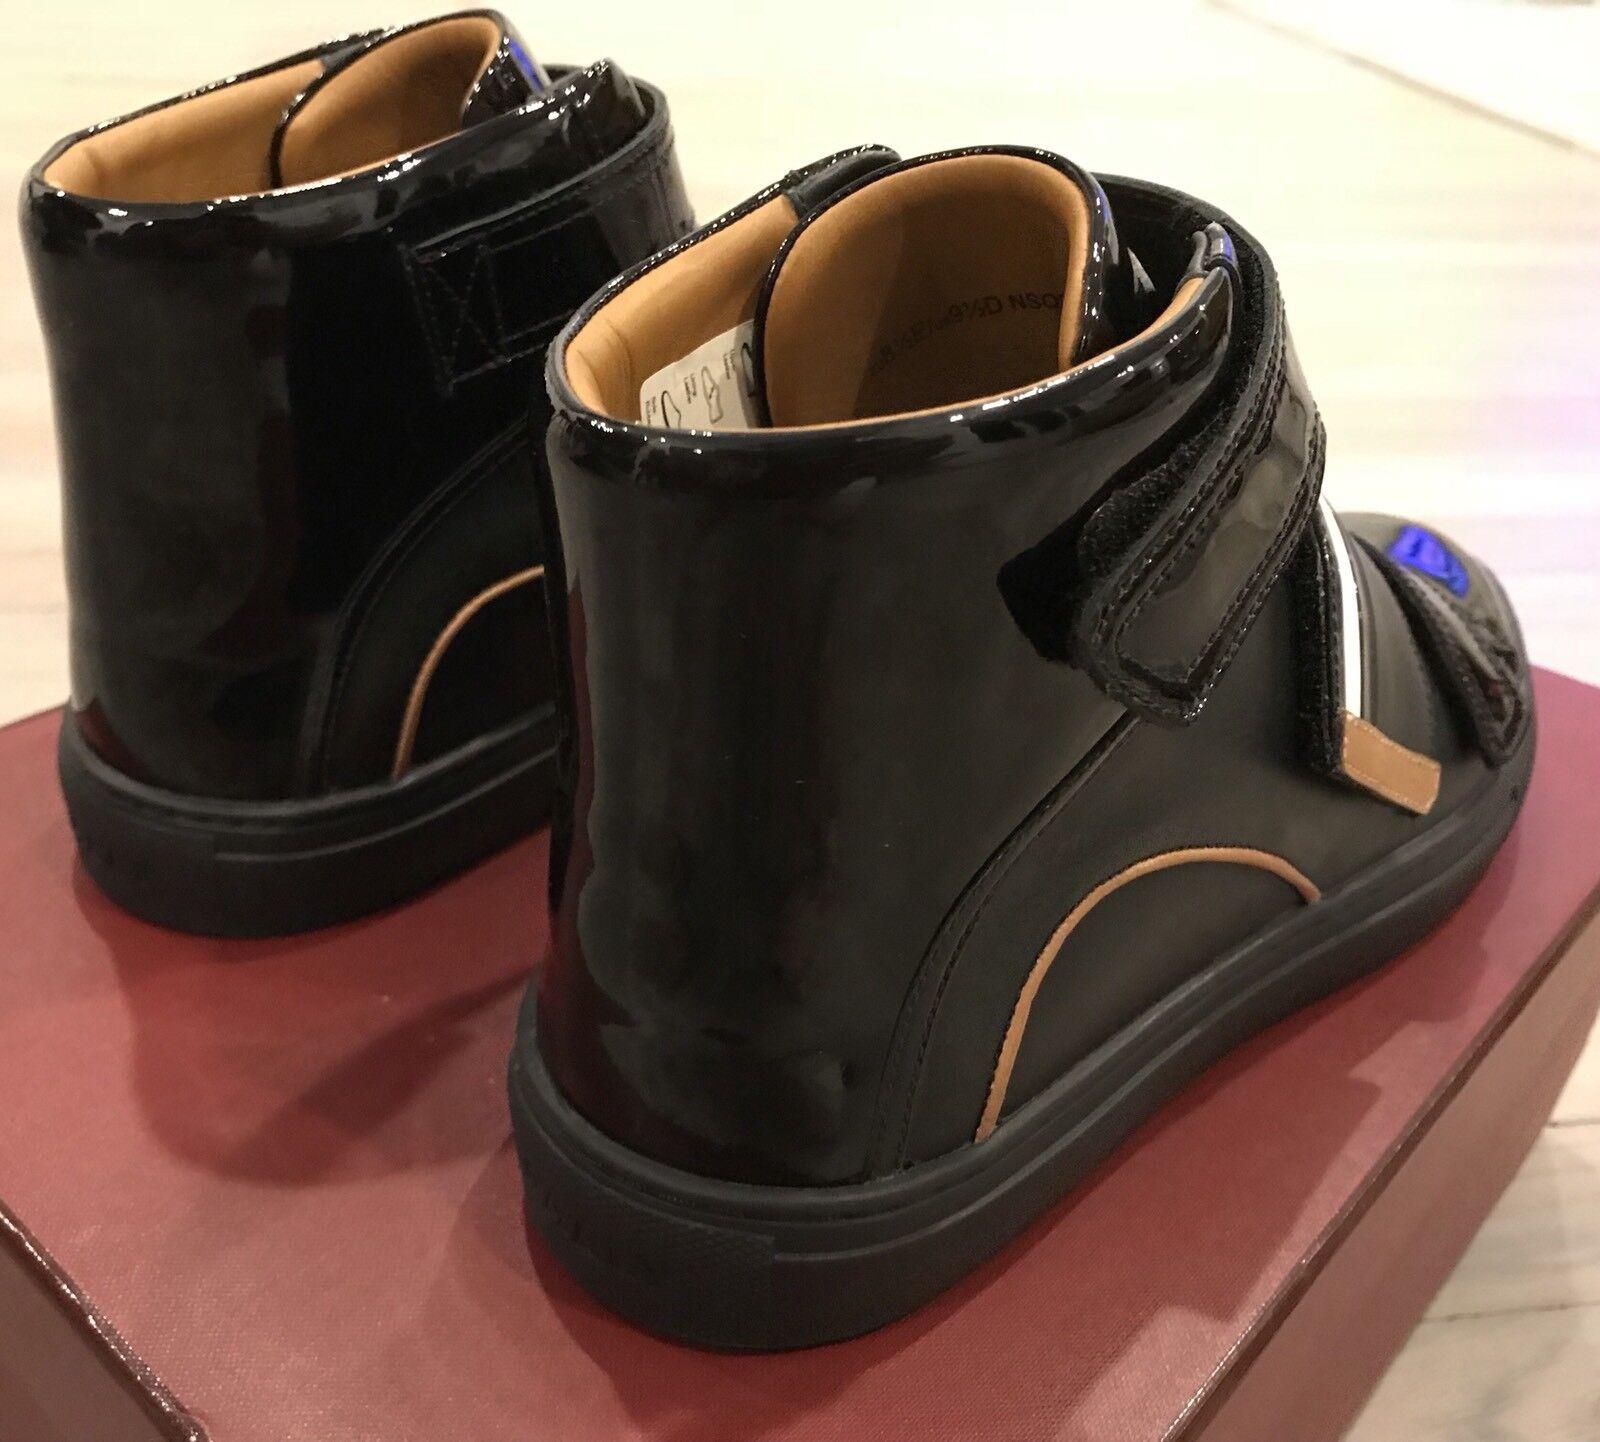 700  Bally Bally Bally Herick nero Leather High Tops scarpe da ginnastica Dimensione US 9 b3173b